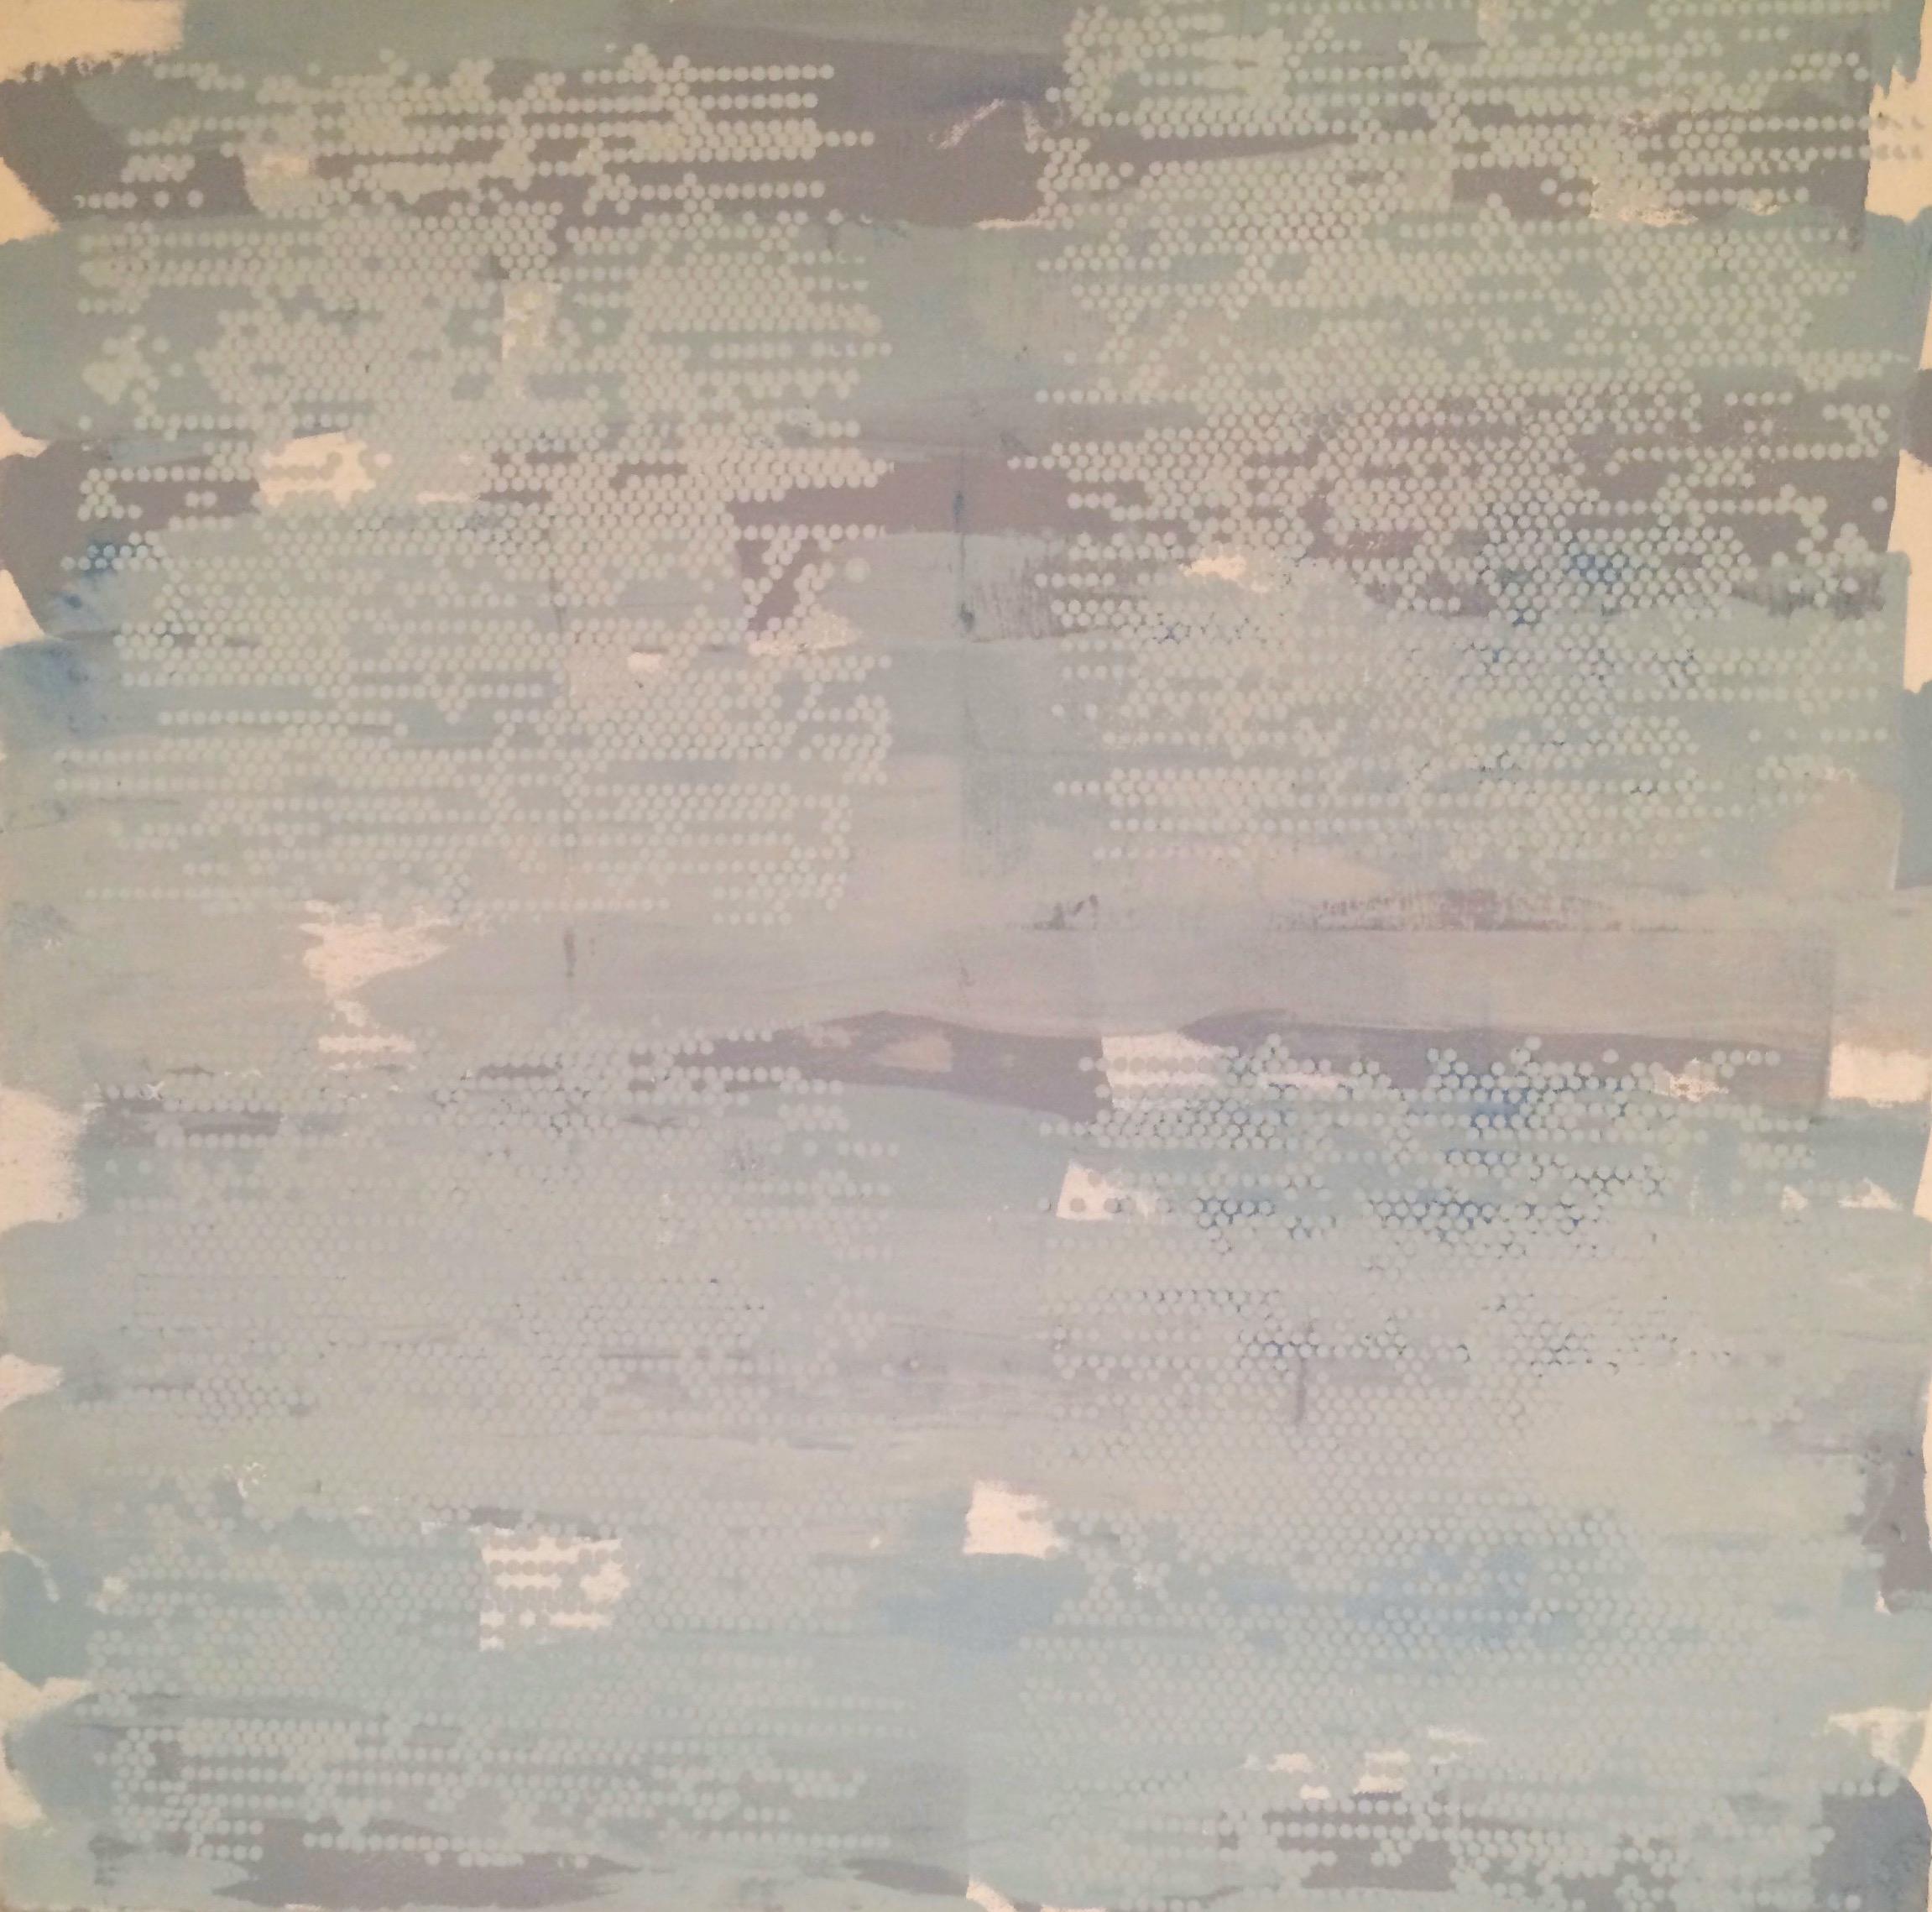 "Blue Lines Dot Matrix, 24"" x 24"", 2015"